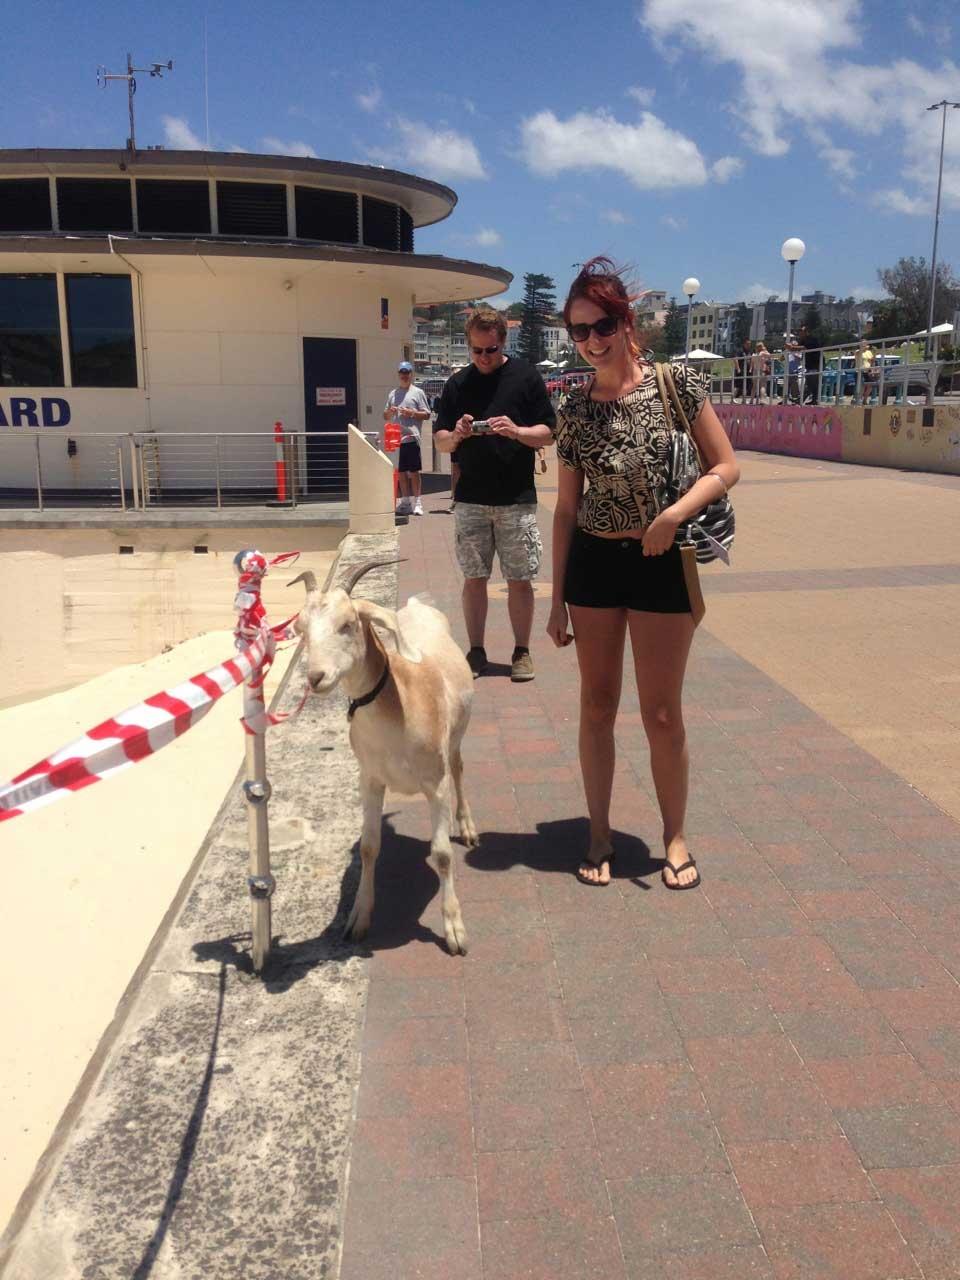 Me standing next to Gary the Goat on Bondi Beach, Sydney